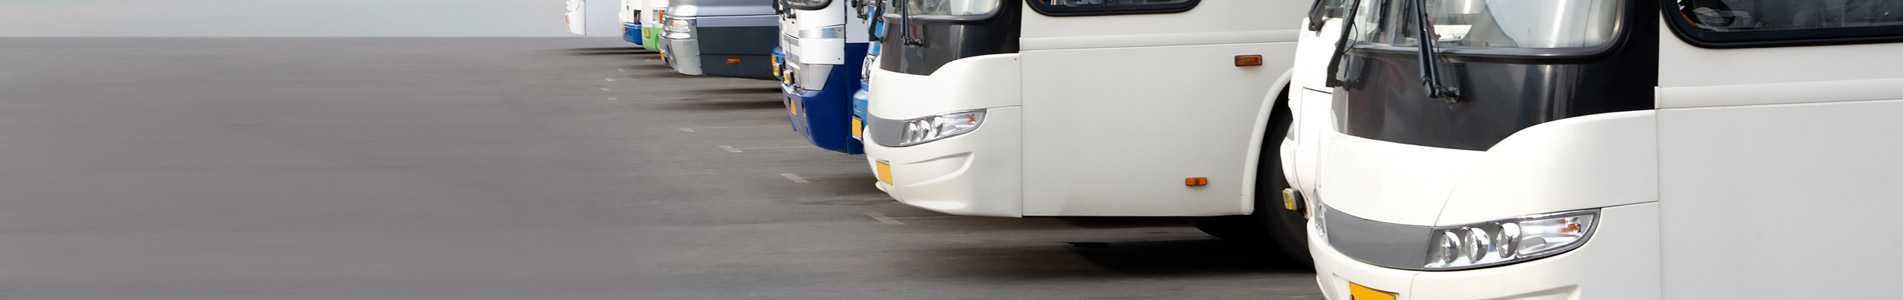 cabecera-bus